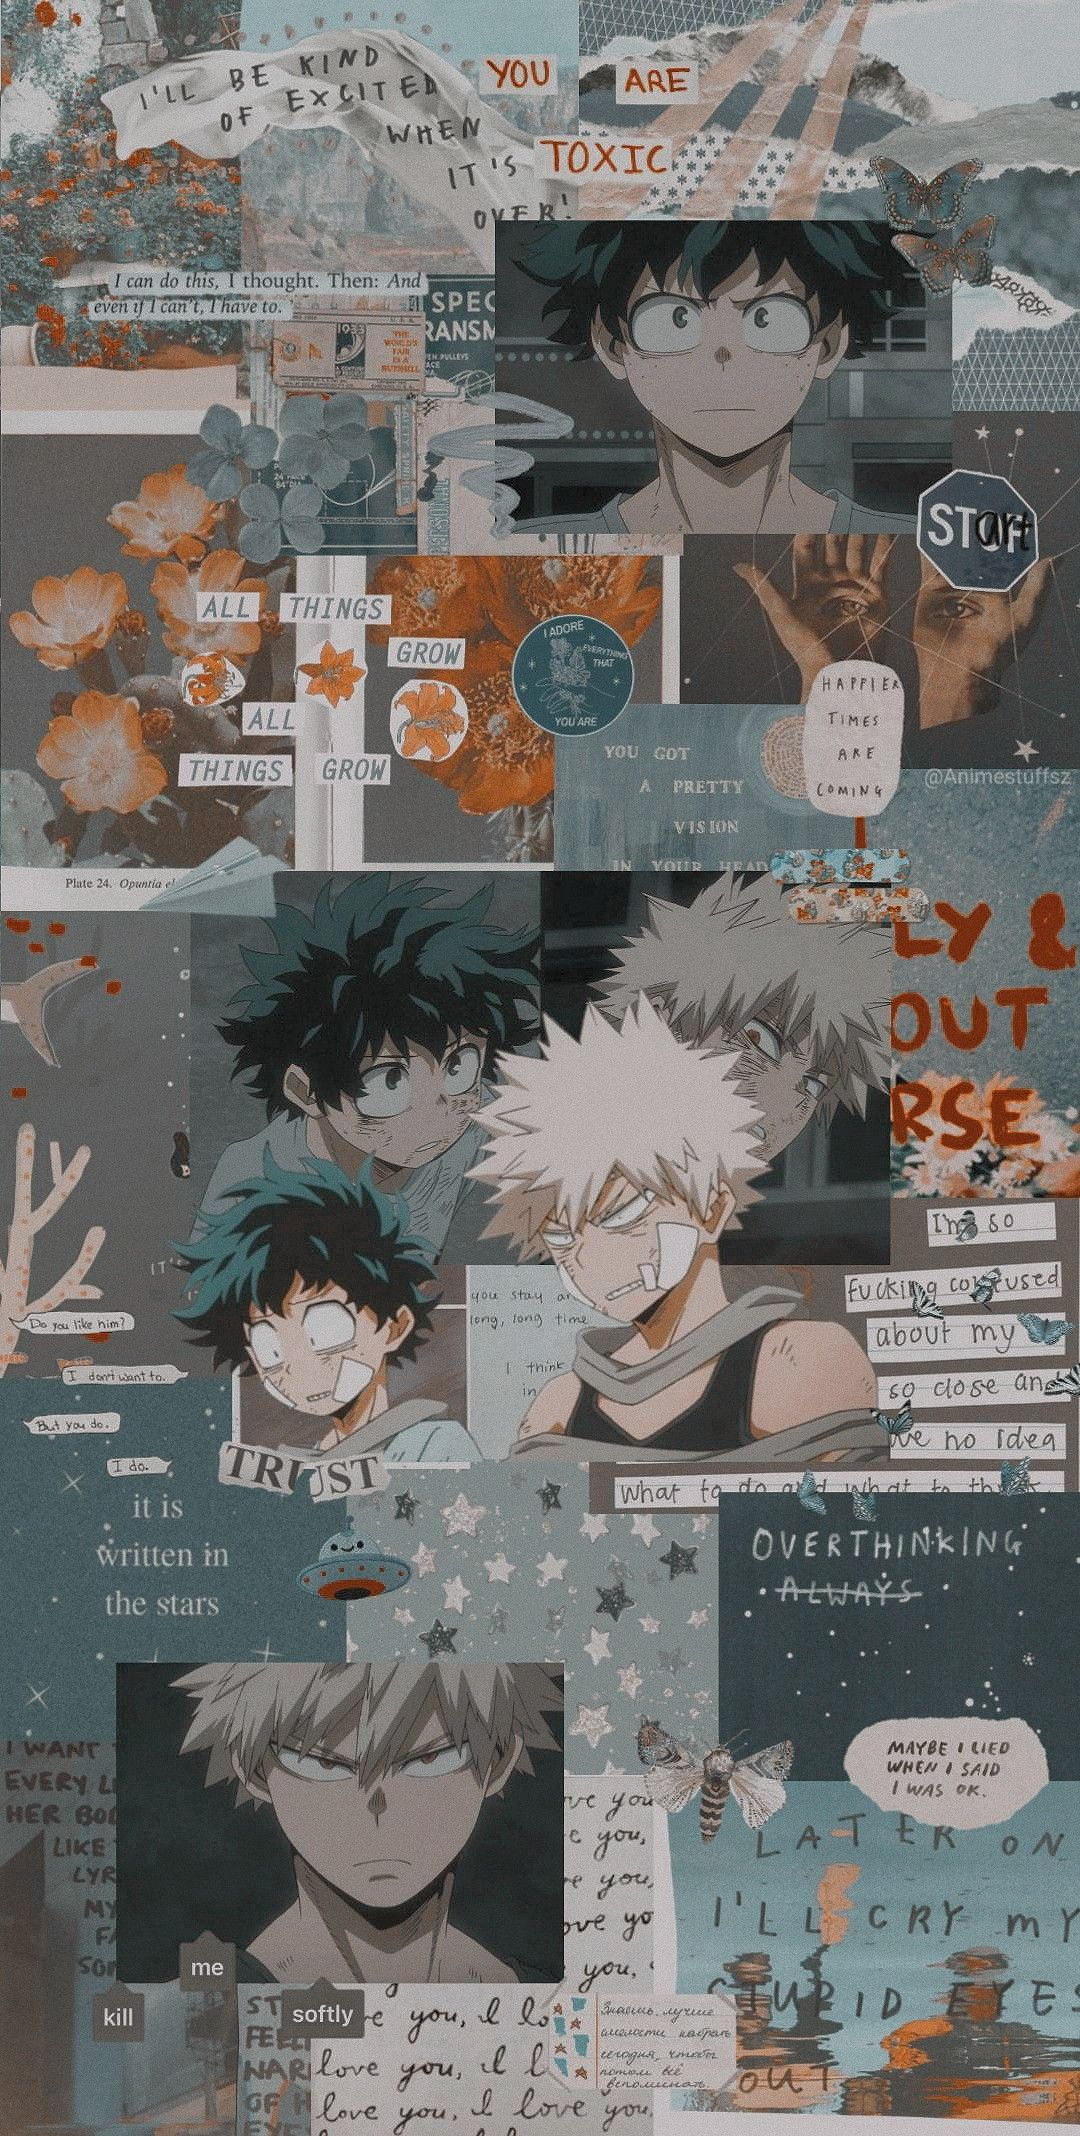 Aesthetic My Hero Academia Wallpaper : aesthetic, academia, wallpaper, Academia, Aesthetic, Anime,, Anime, Wallpaper, Iphone,